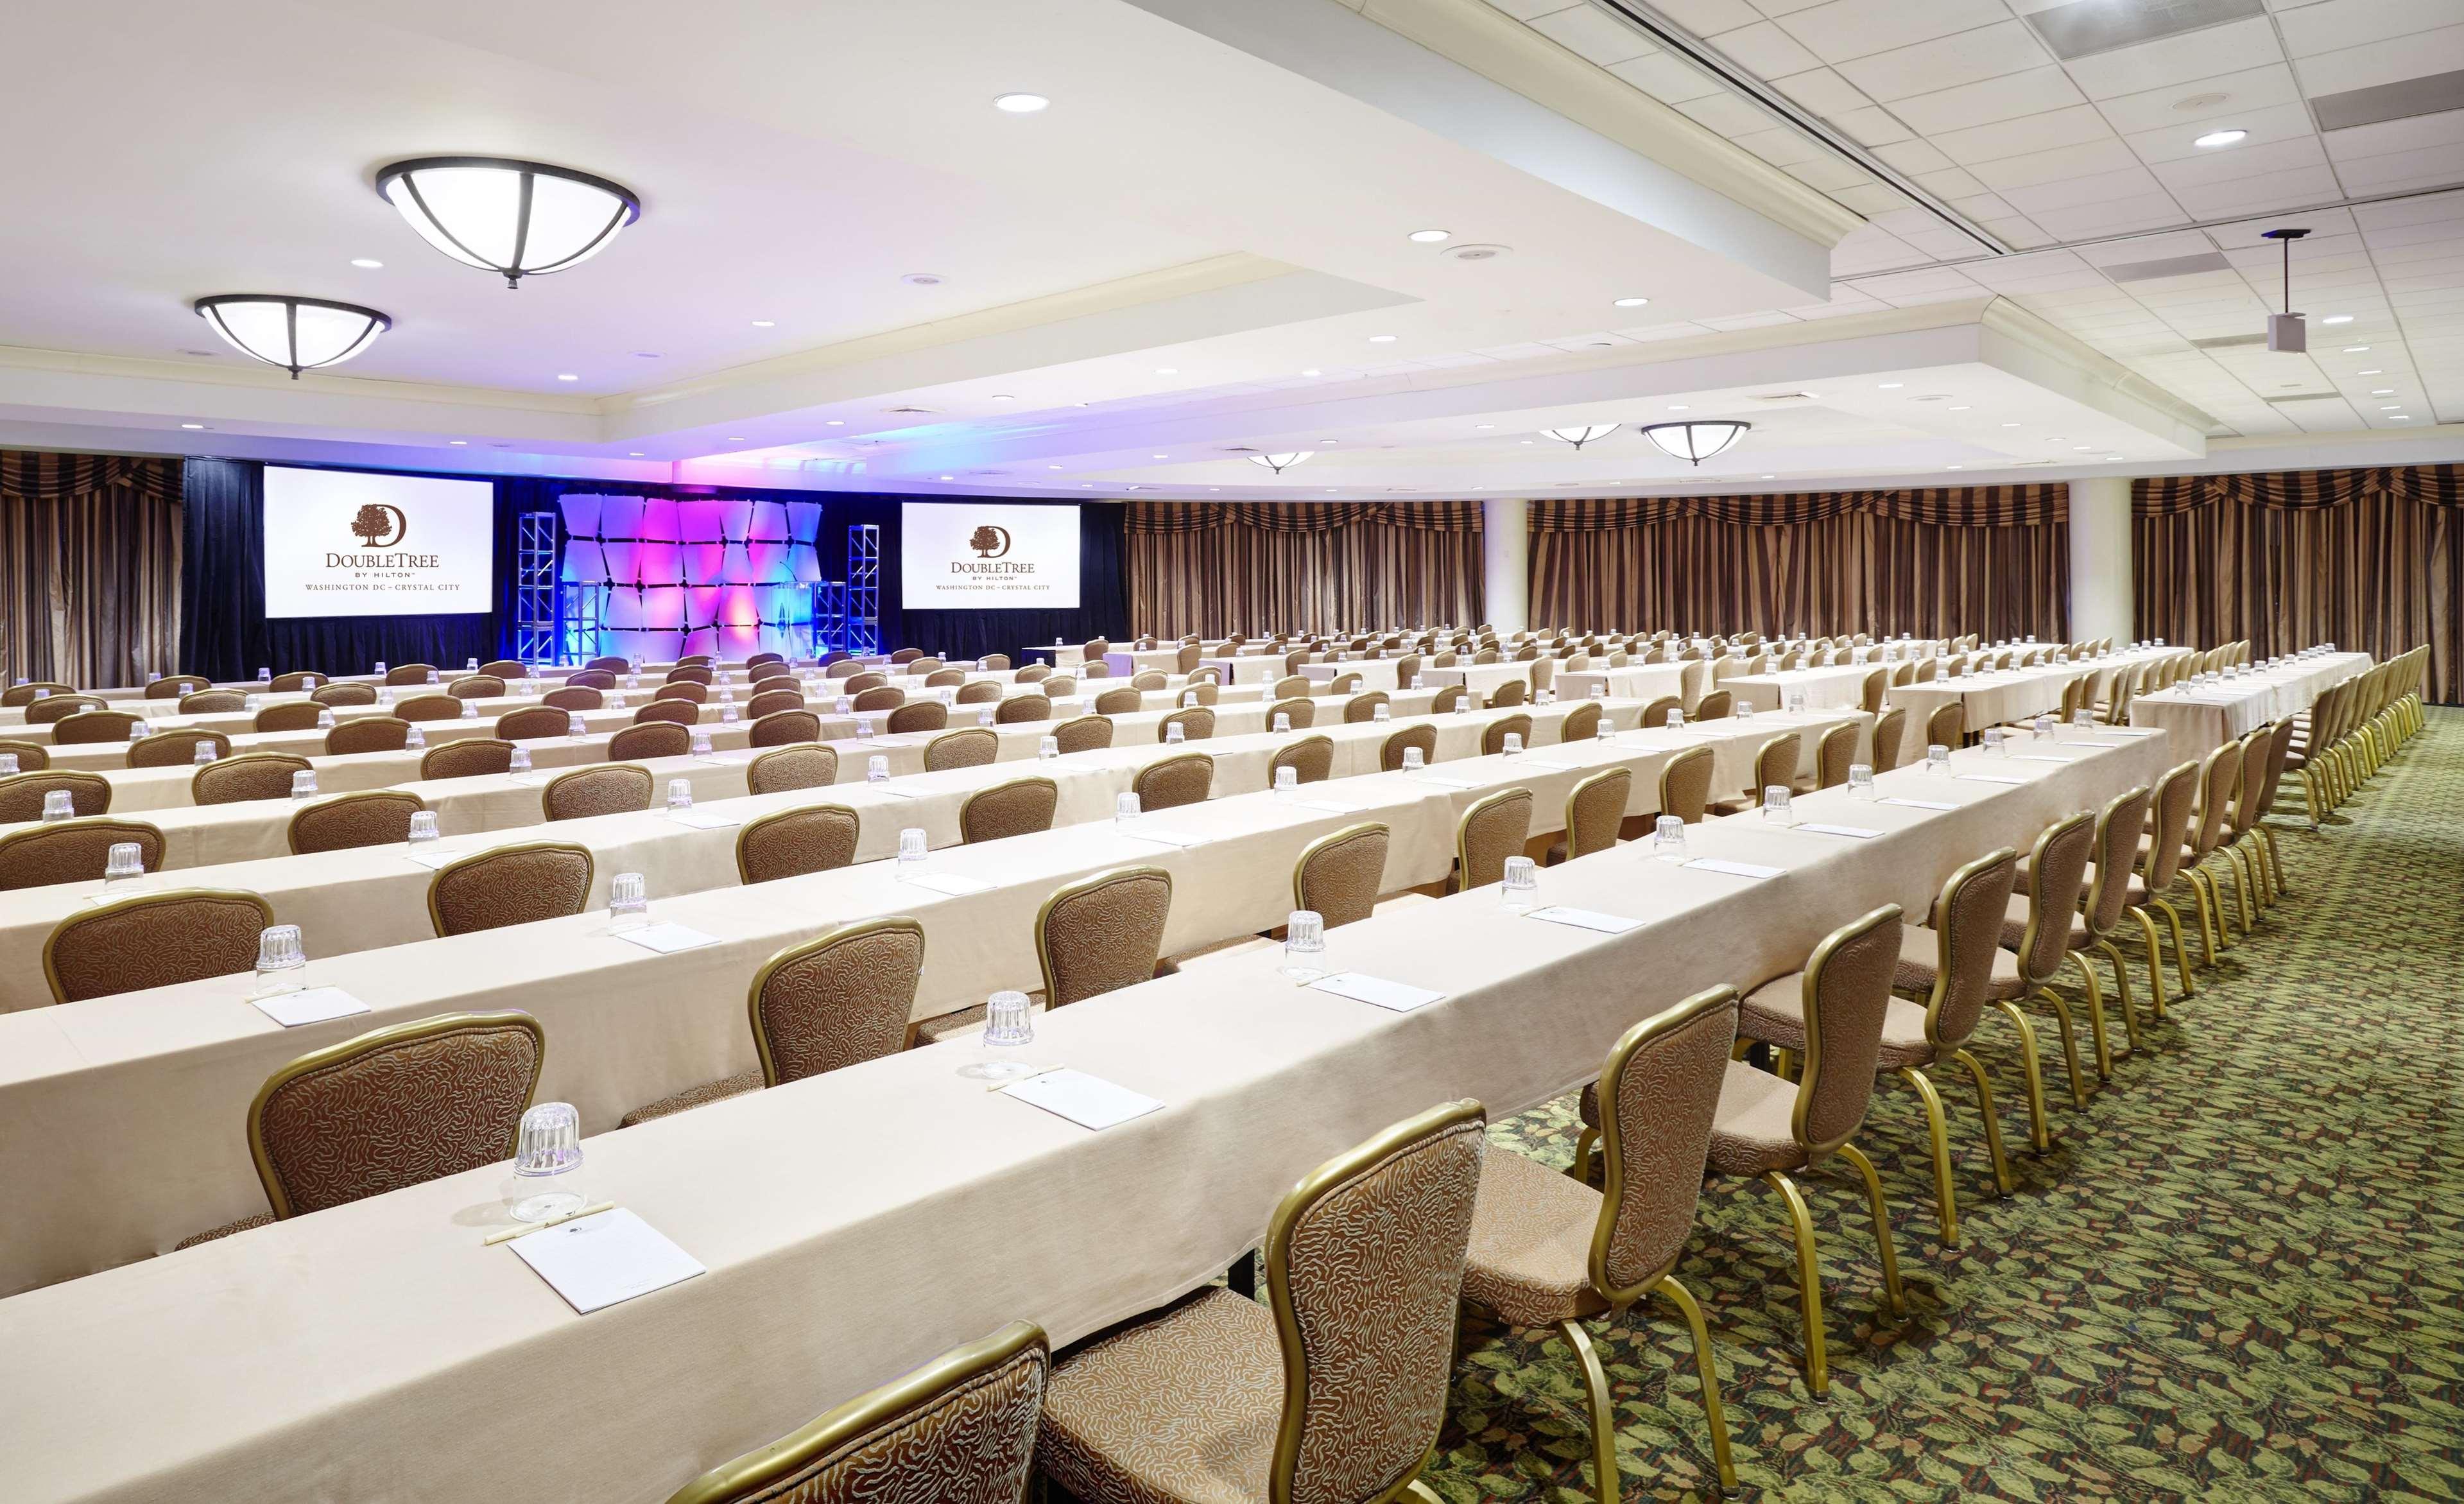 Pentagon Dining Room Doubletree By Hilton Hotel Washington Dc Crystal City